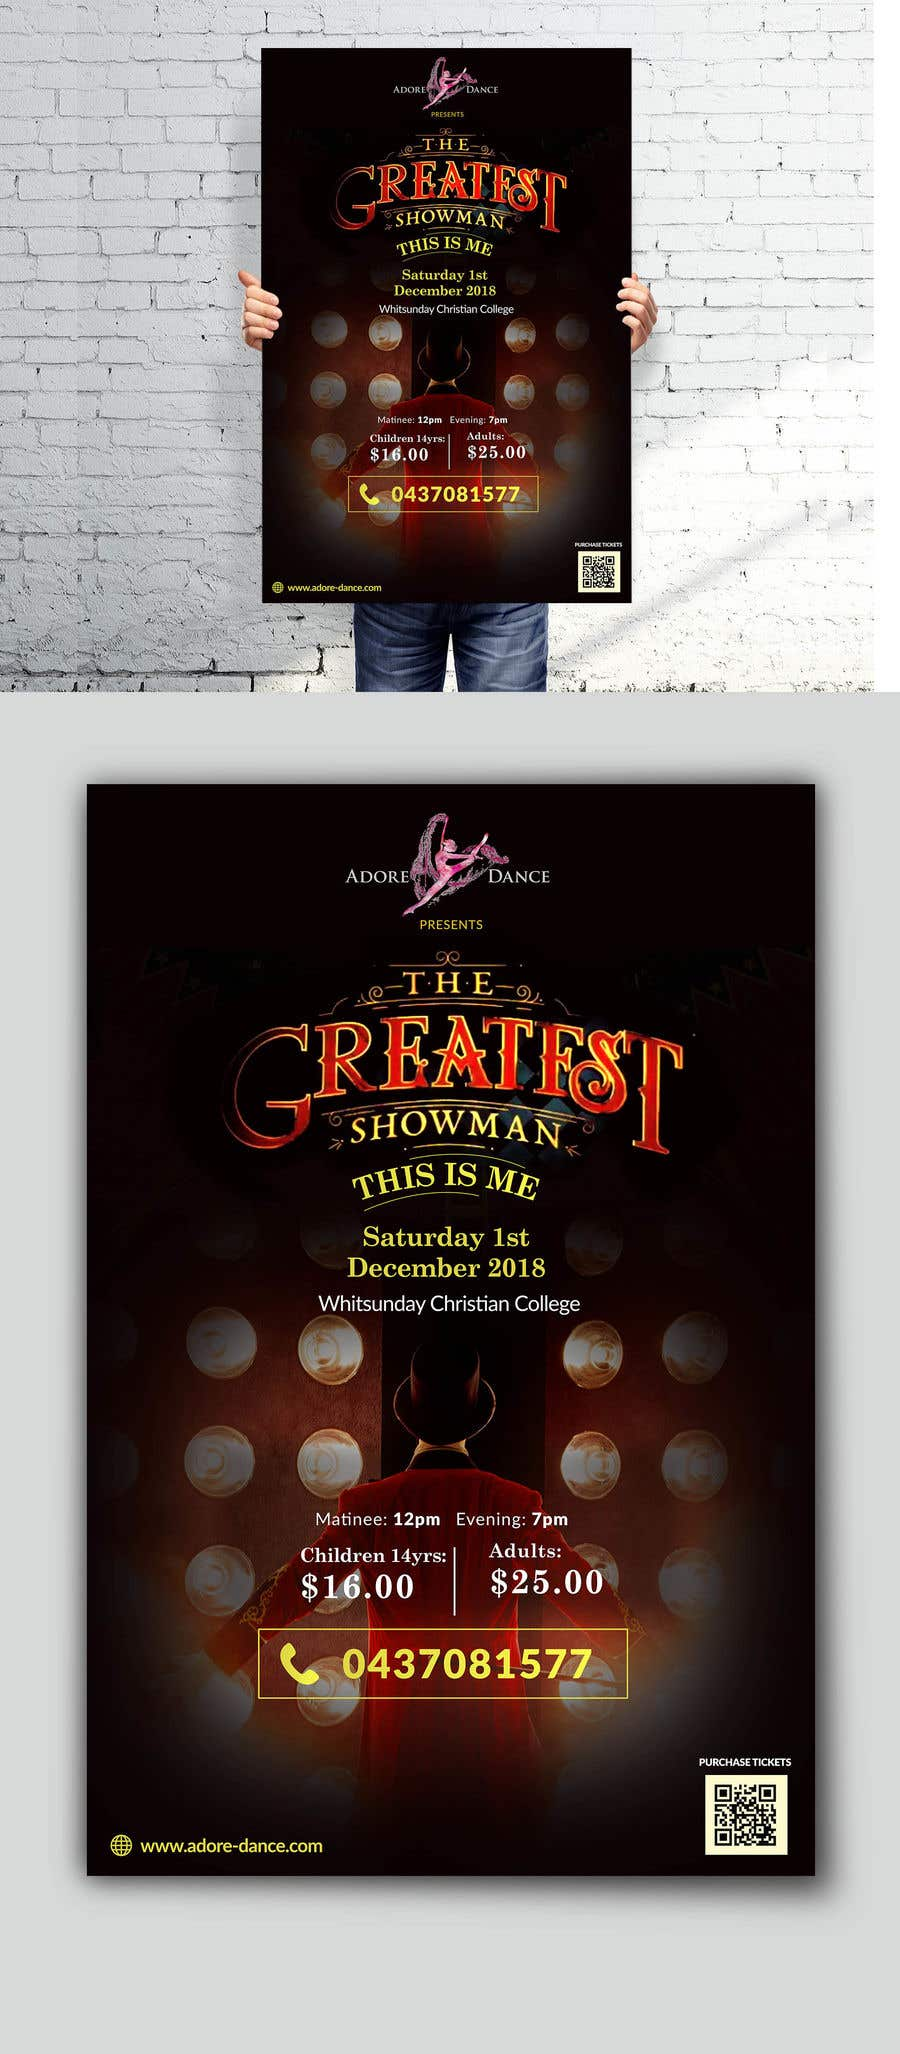 Konkurrenceindlæg #12 for The Greatest Showman Poster